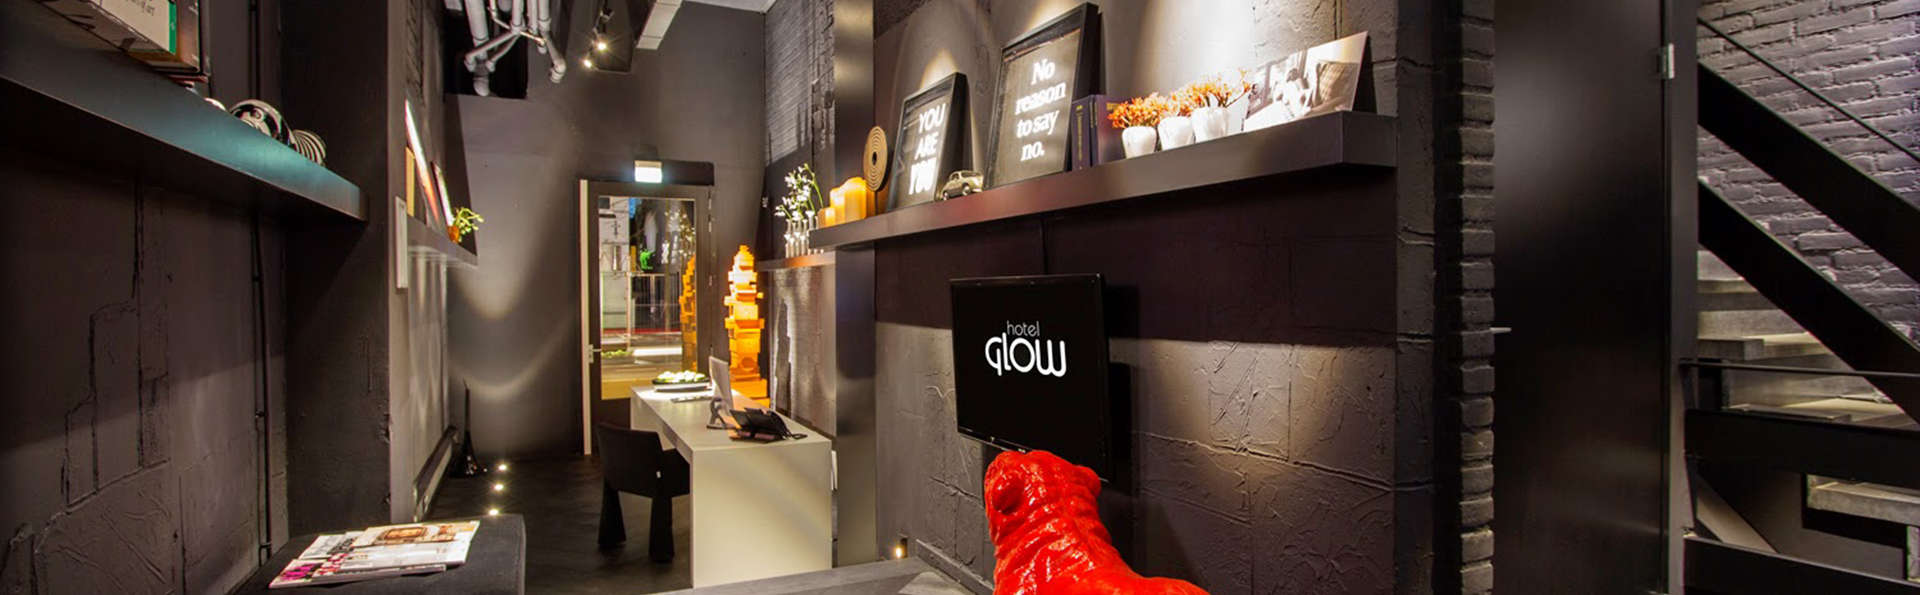 Boutique hotel glow 3 eindhoven nederland for Boutique hotel alpen